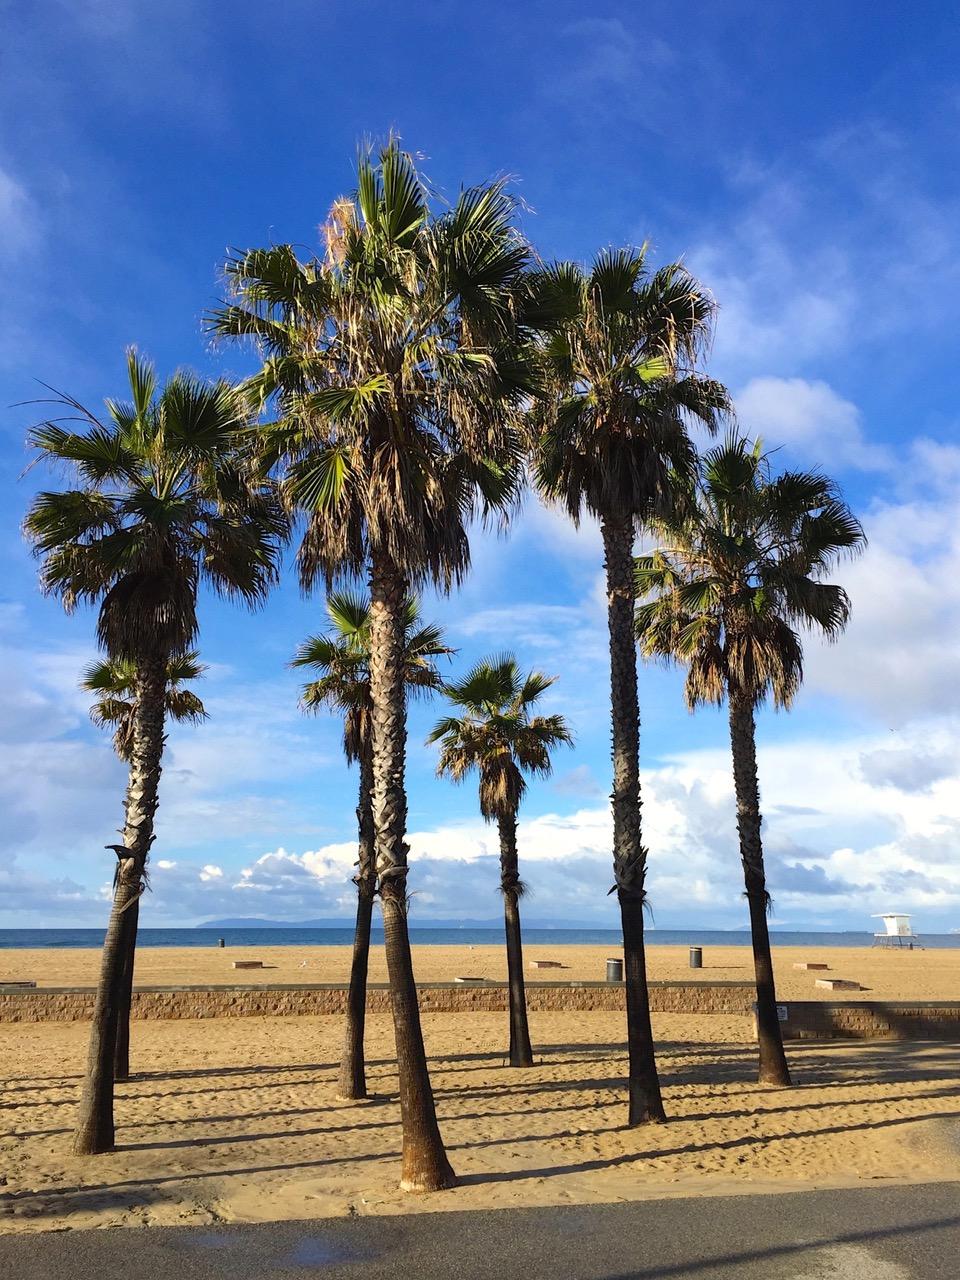 Palm trees at Huntington Beach, California